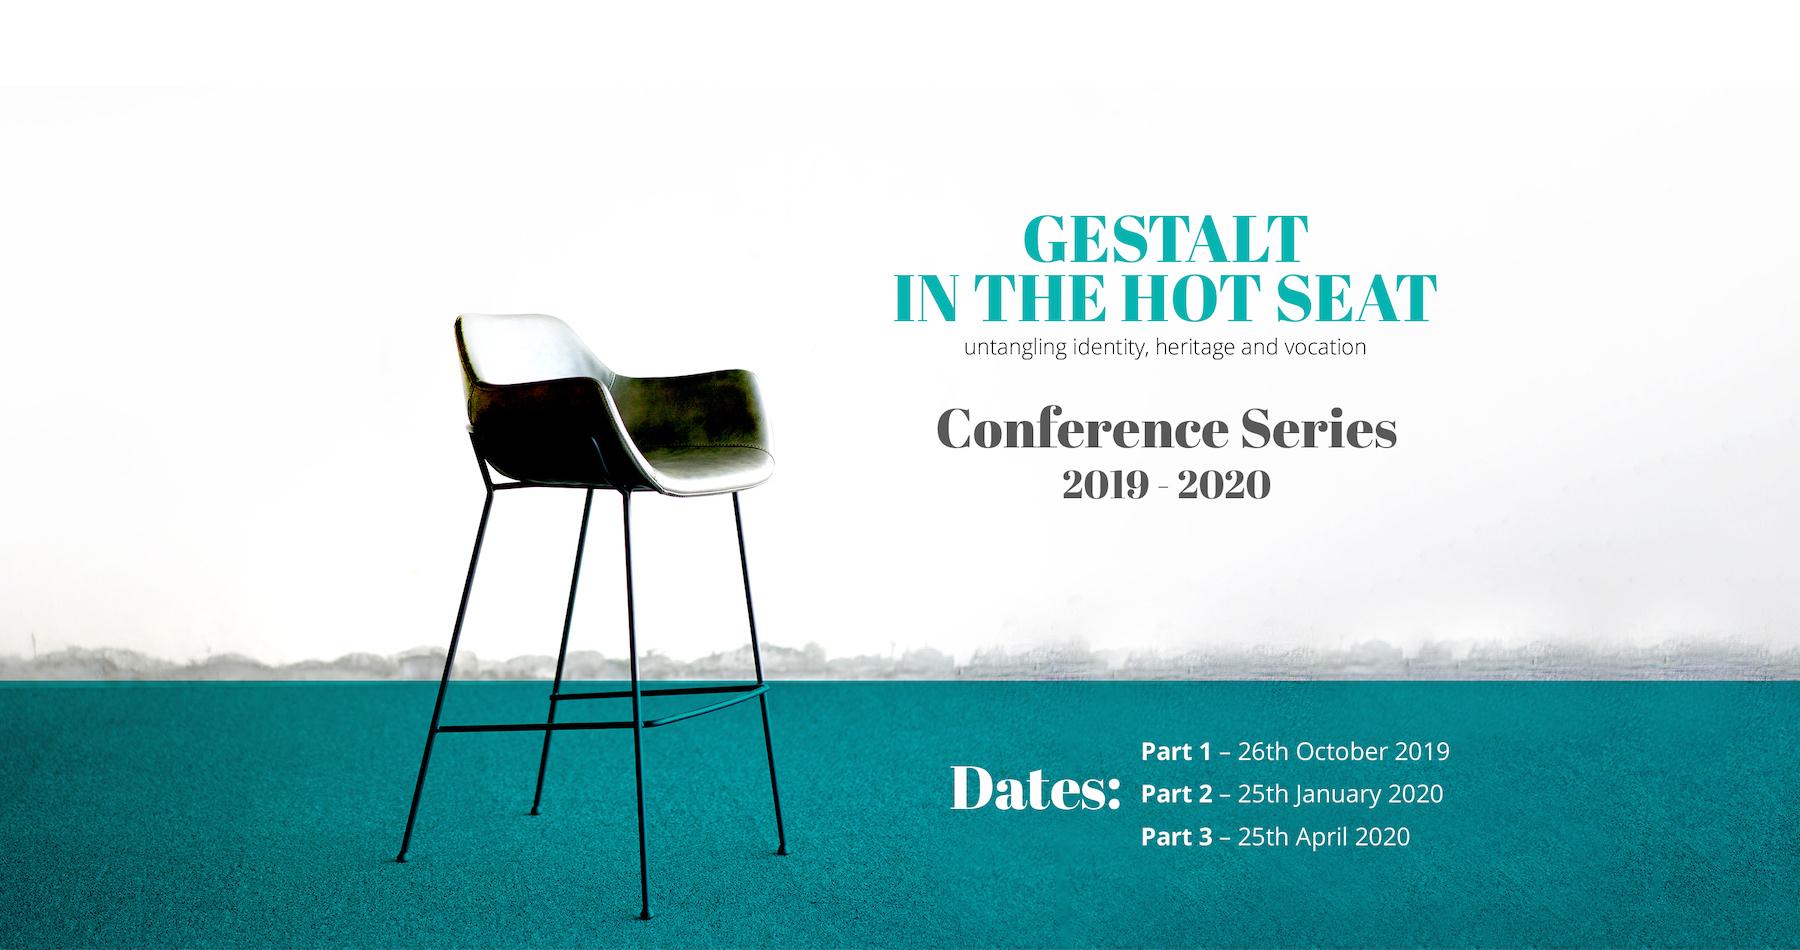 GESTALT IN THE HOT SEAT – New Gestalt Voices